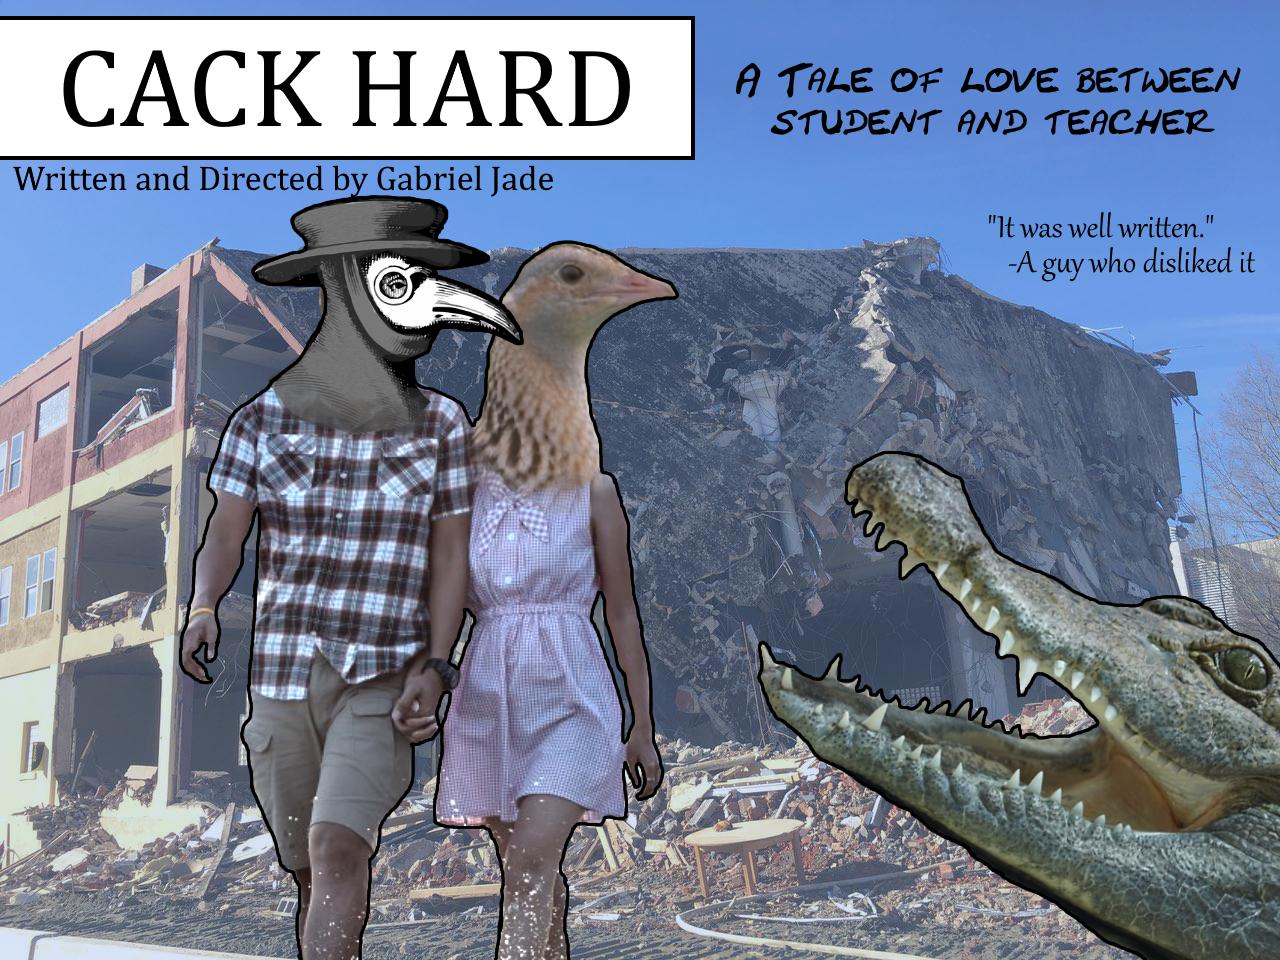 cack_hard_poster.png